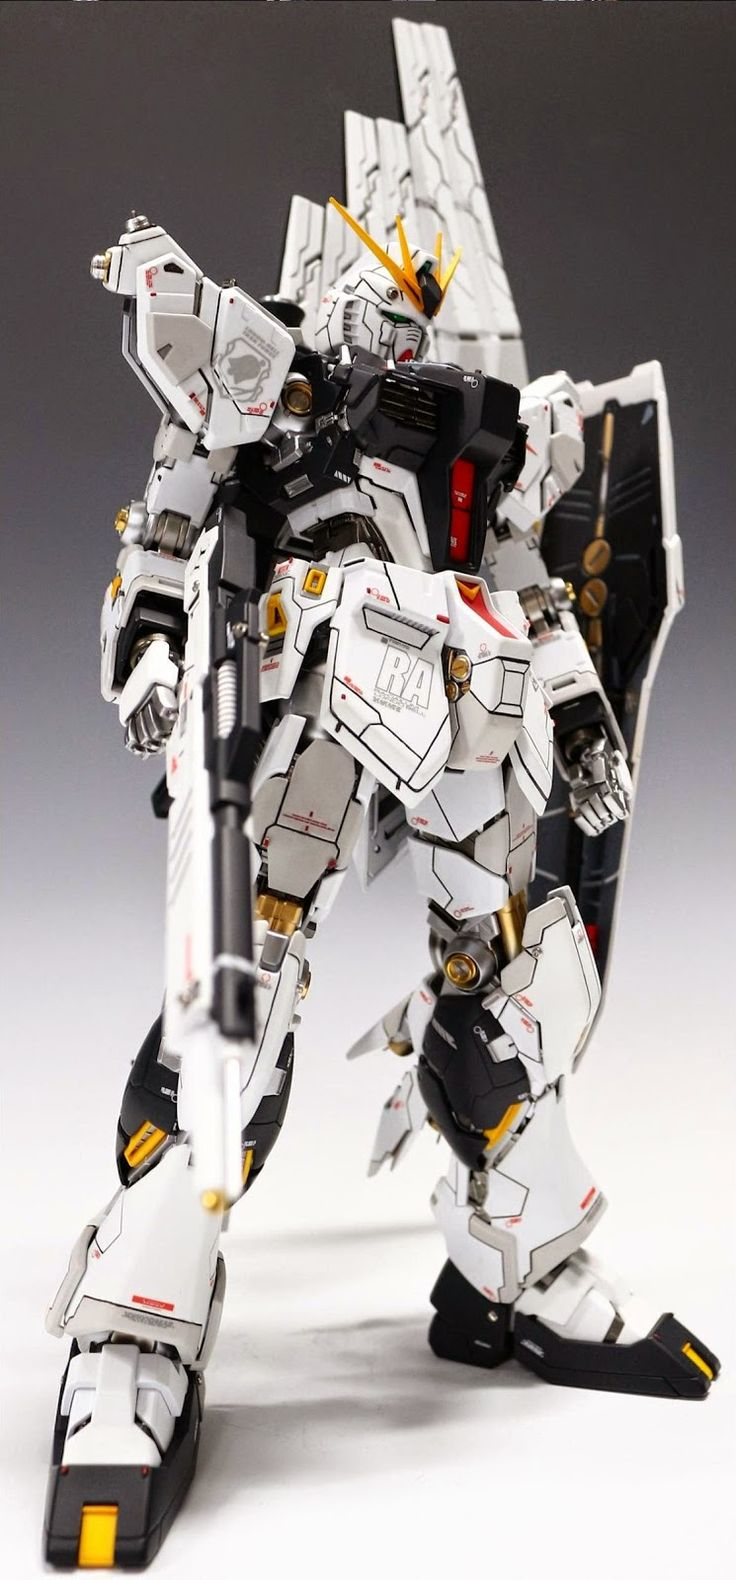 GUNDAM GUY: MG 1/100 RX-93 Nu Gundam Ver. Ka - Customized Build